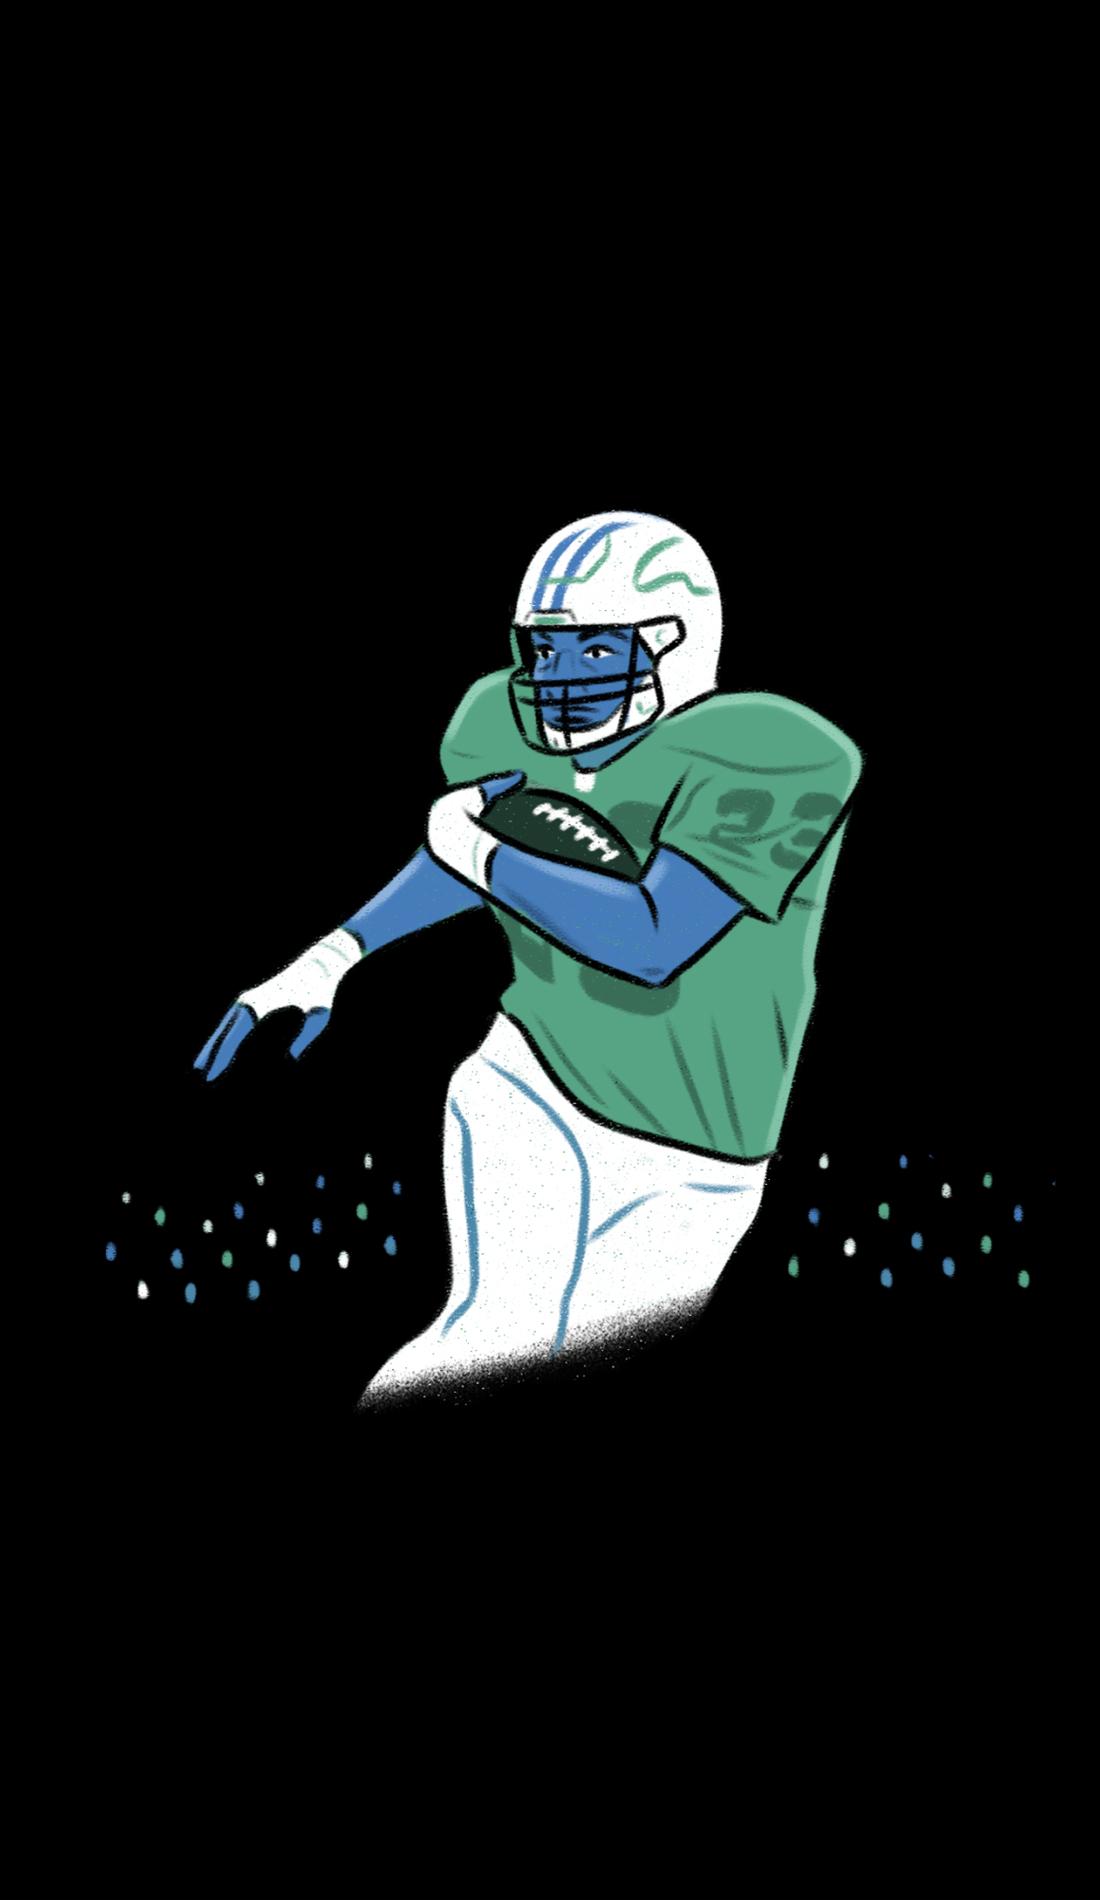 A Princeton Tigers Football live event